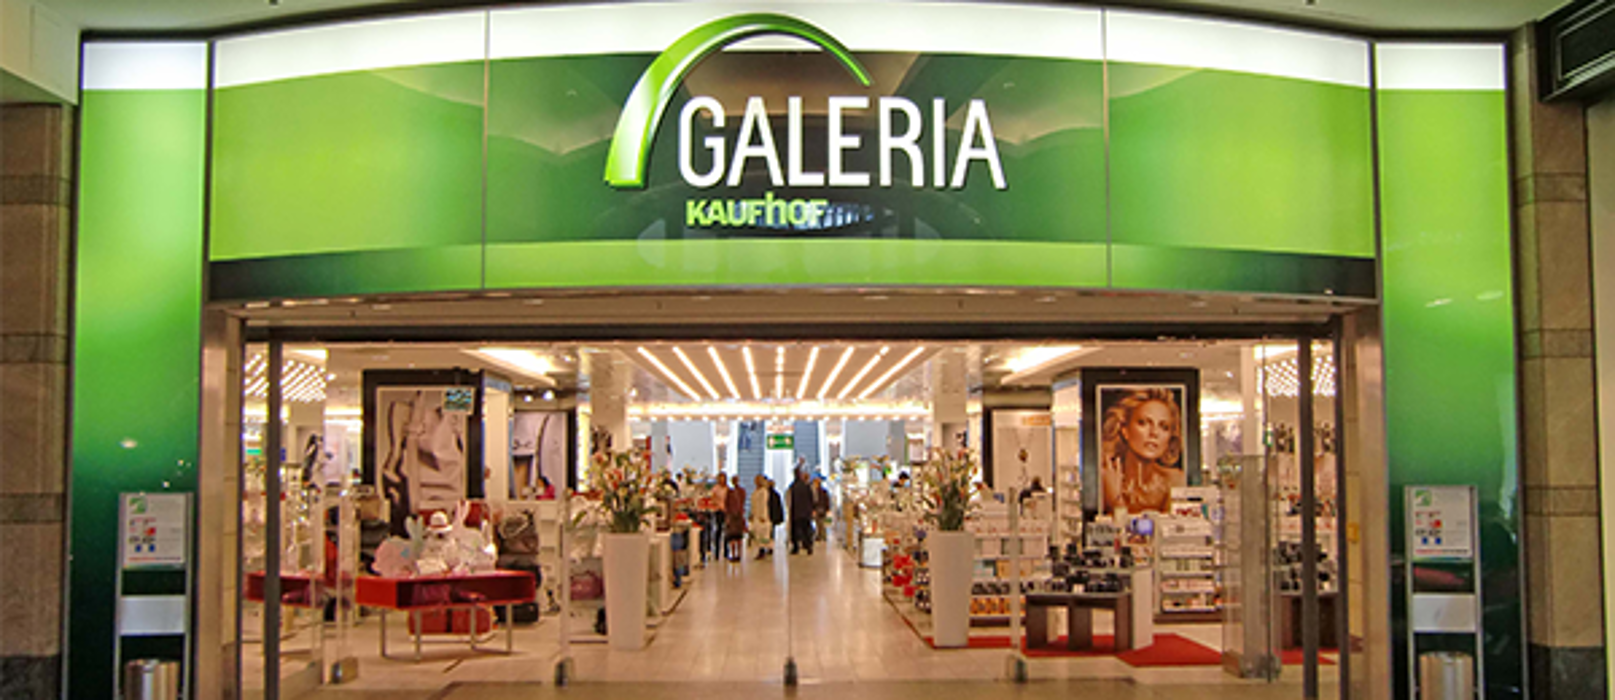 GALERIA (Kaufhof) Oberhausen CentrO, Centroallee in Oberhausen